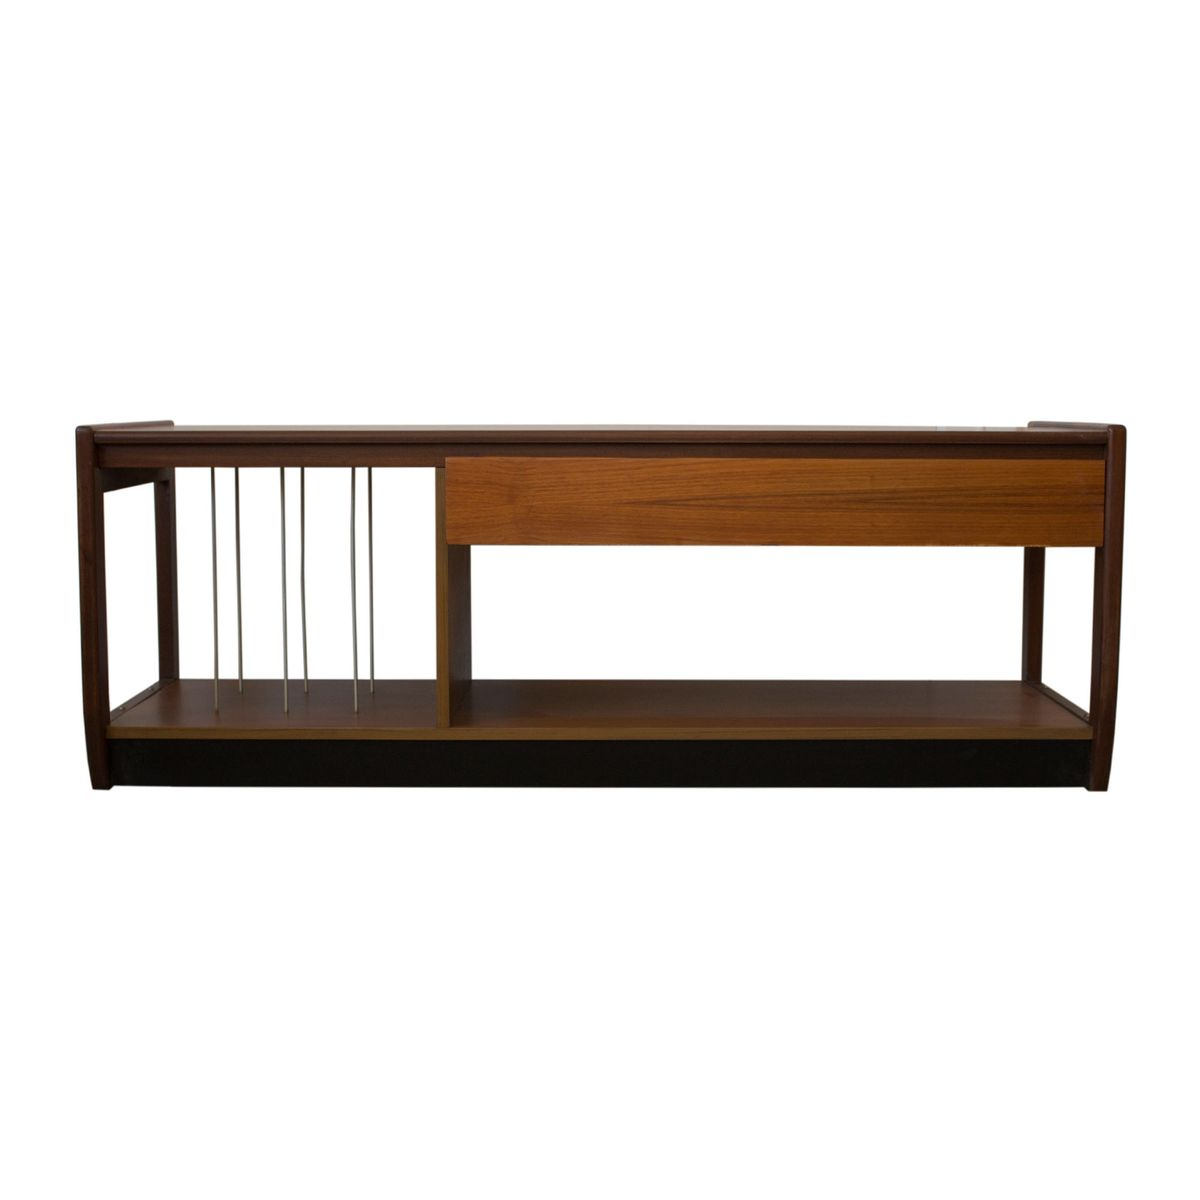 Franz sisches sideboard 1960er bei pamono kaufen for Sideboard 4 meter lang